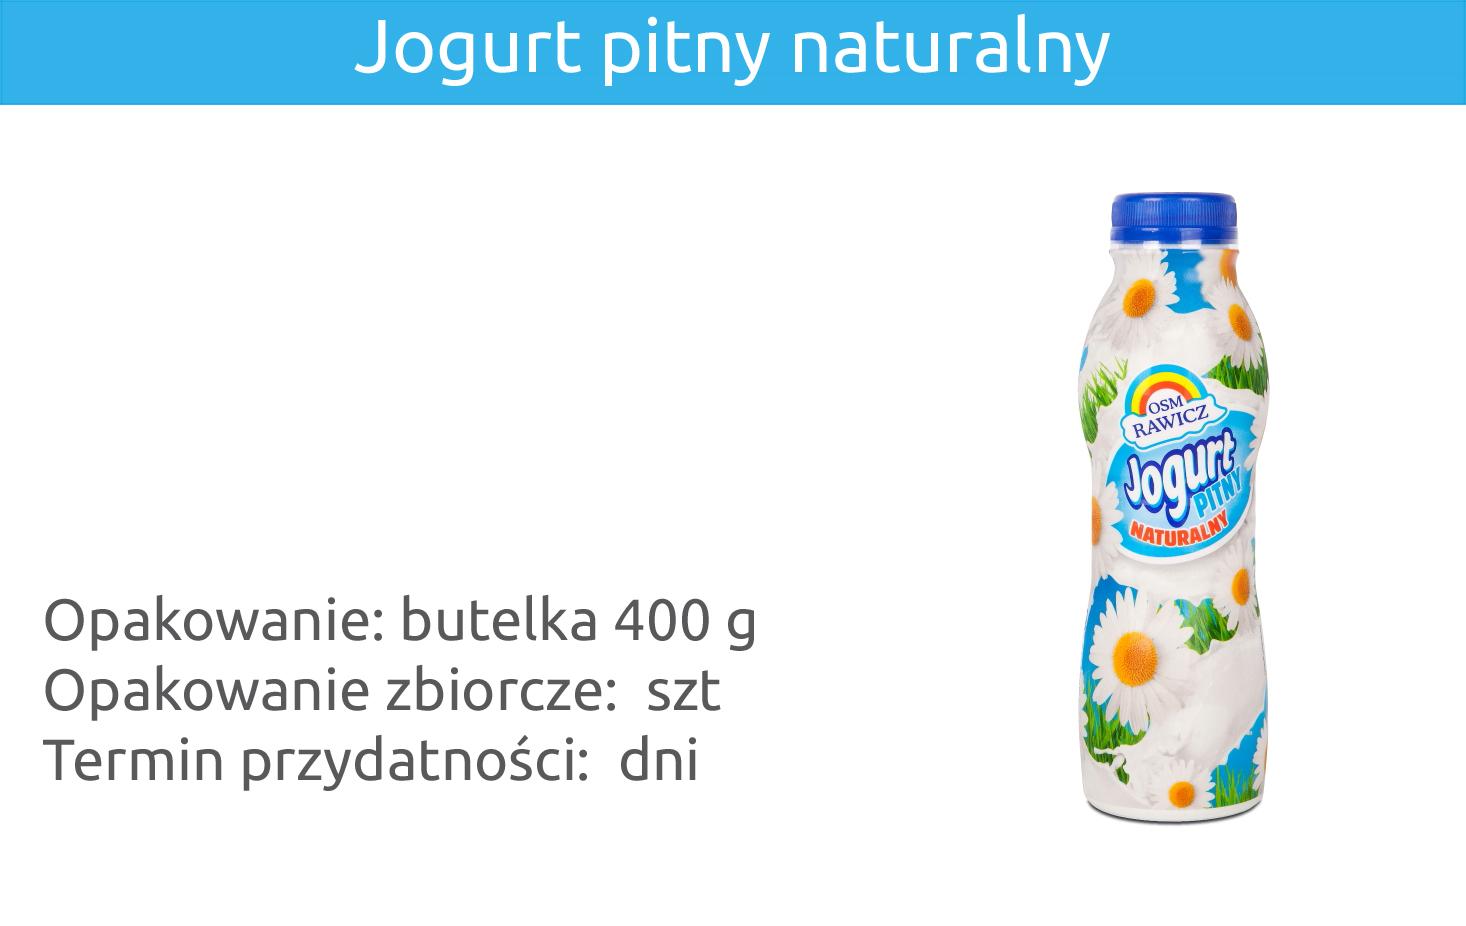 Jogurt pitny naturalny